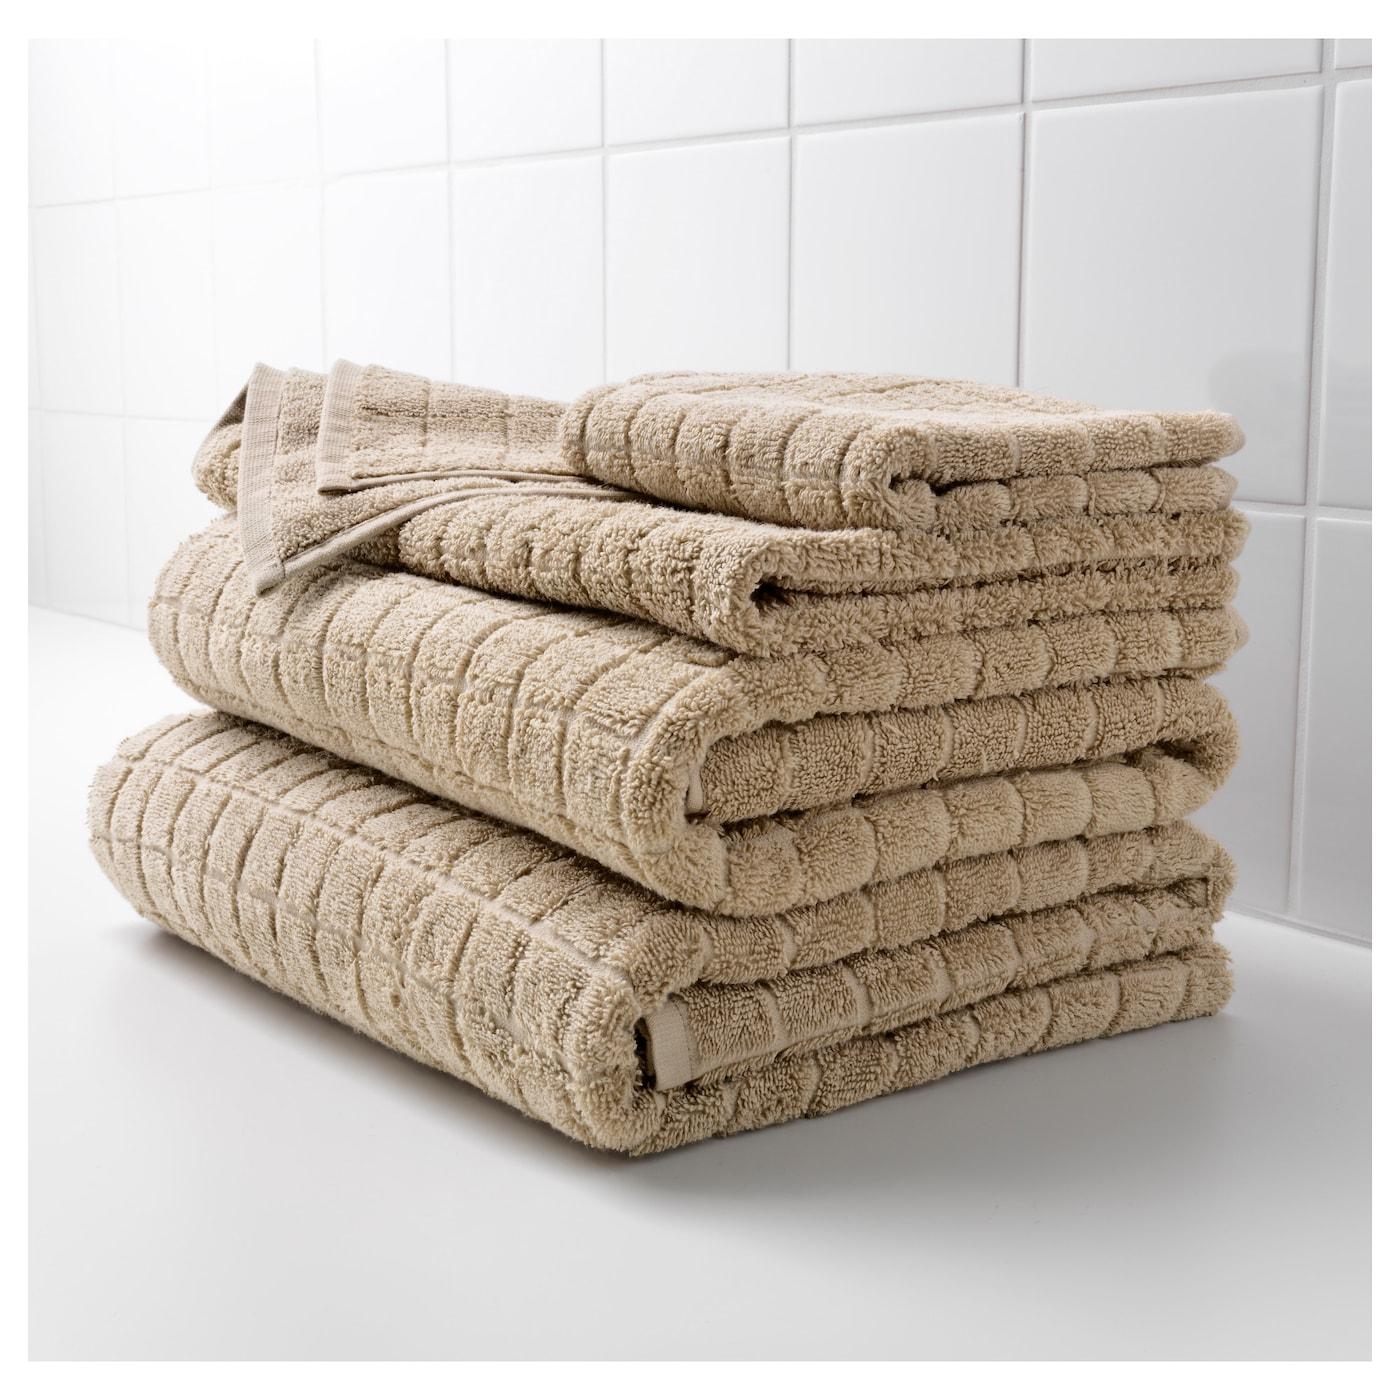 fj rden drap de bain beige fonc 70x140 cm ikea. Black Bedroom Furniture Sets. Home Design Ideas